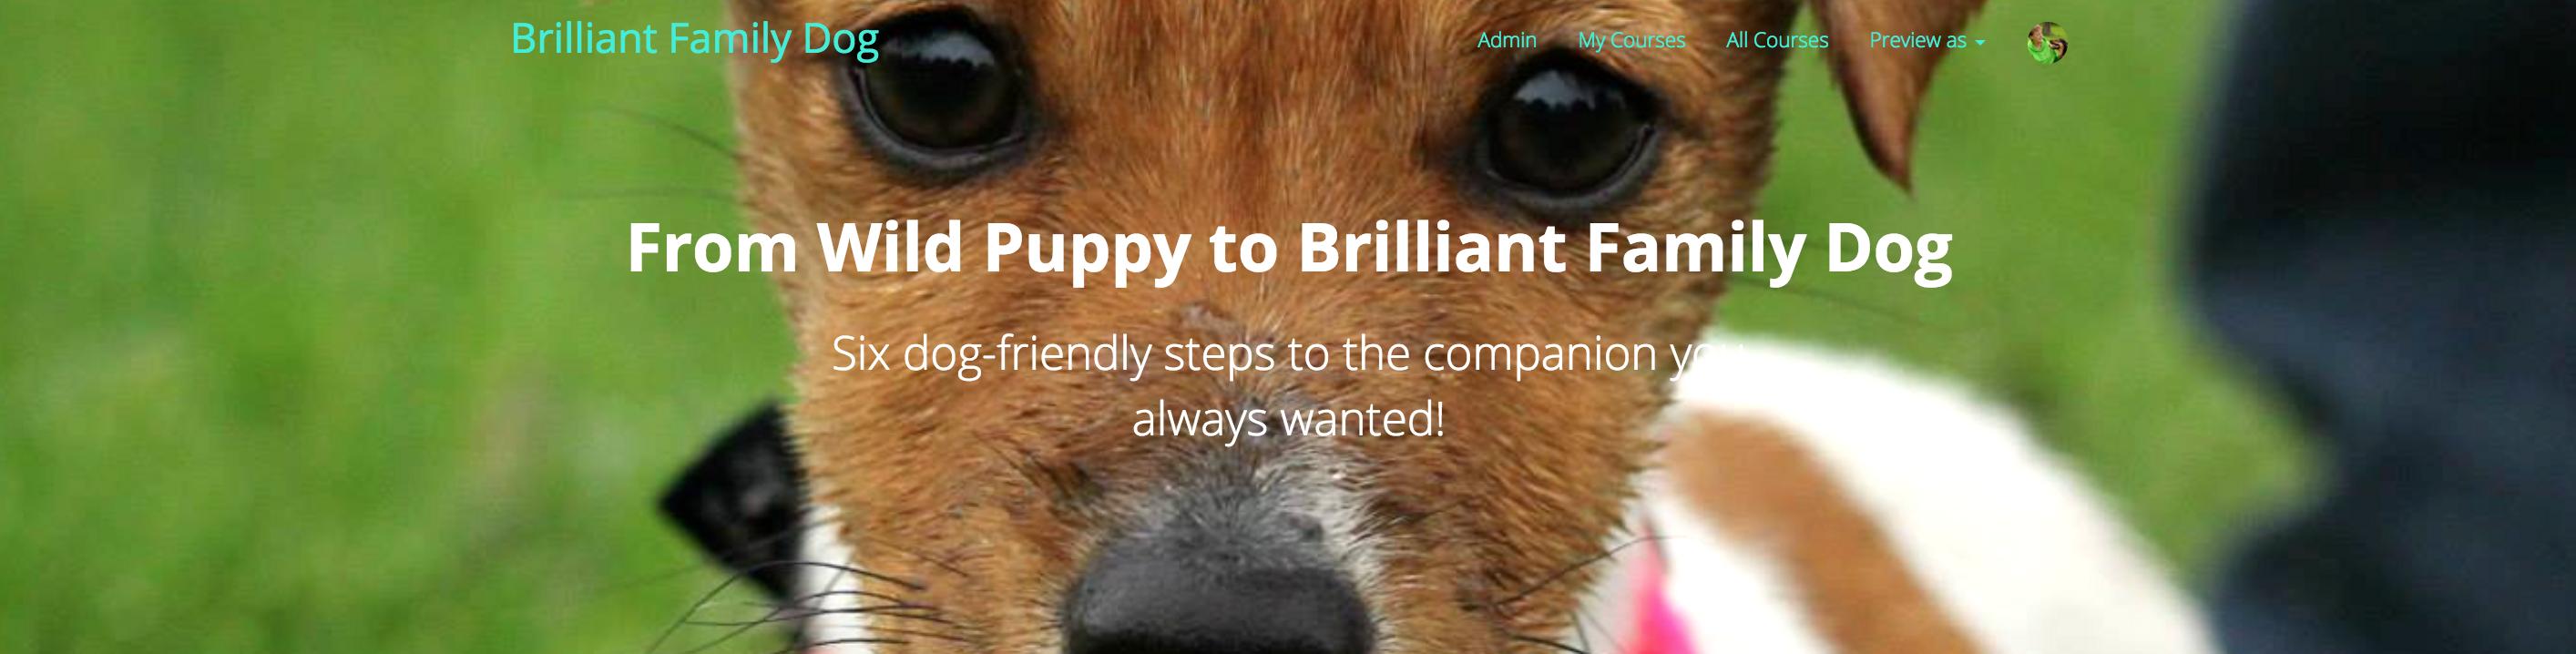 New puppy, puppy class, puppy training | Online course: From Wild Puppy to Brilliant Family Dog | www.brilliantfamilydog.com